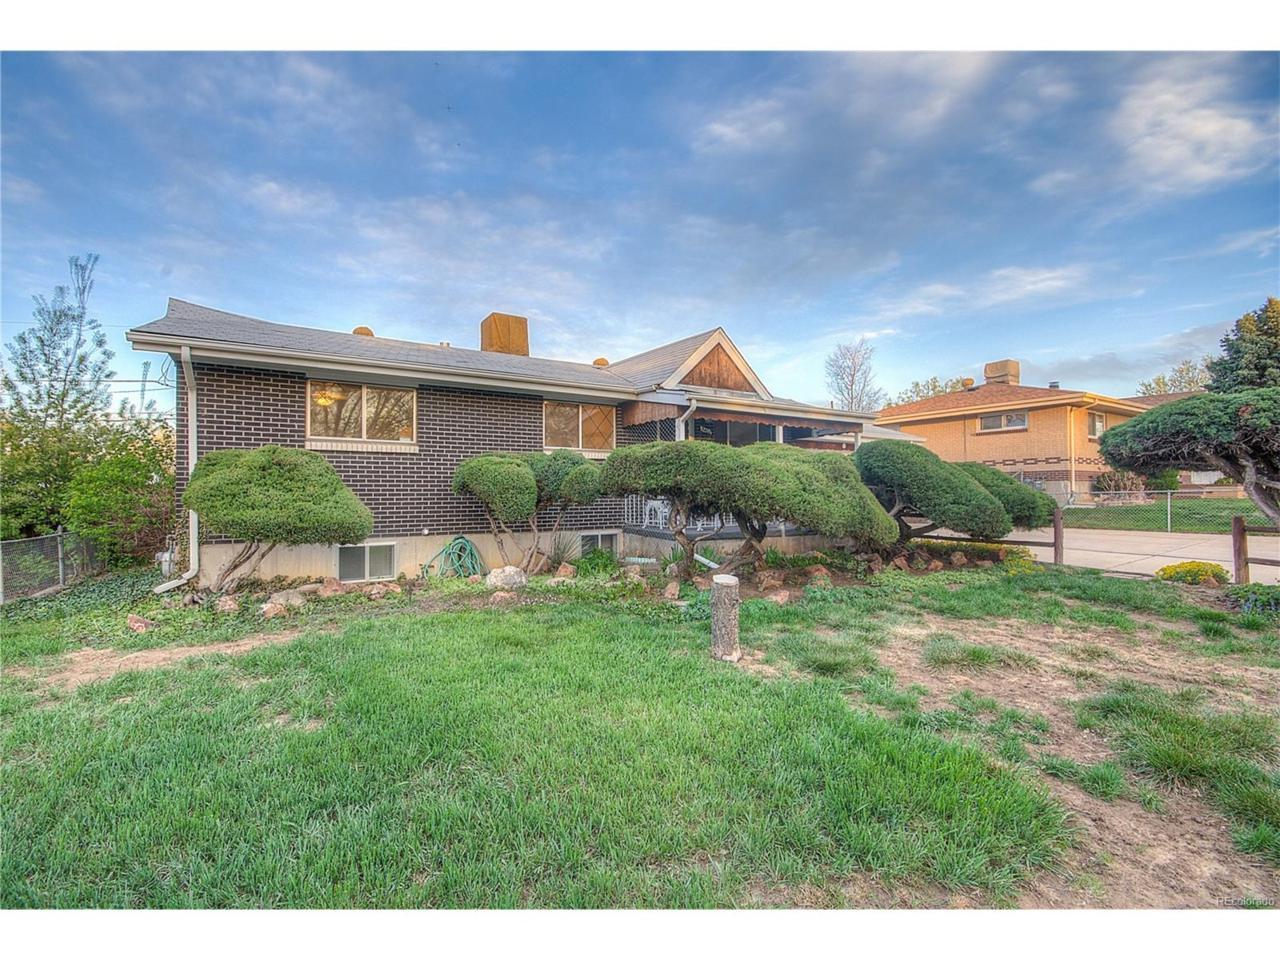 5402 Shoshone Street, Denver, CO 80221 (MLS #8121121) :: 8z Real Estate